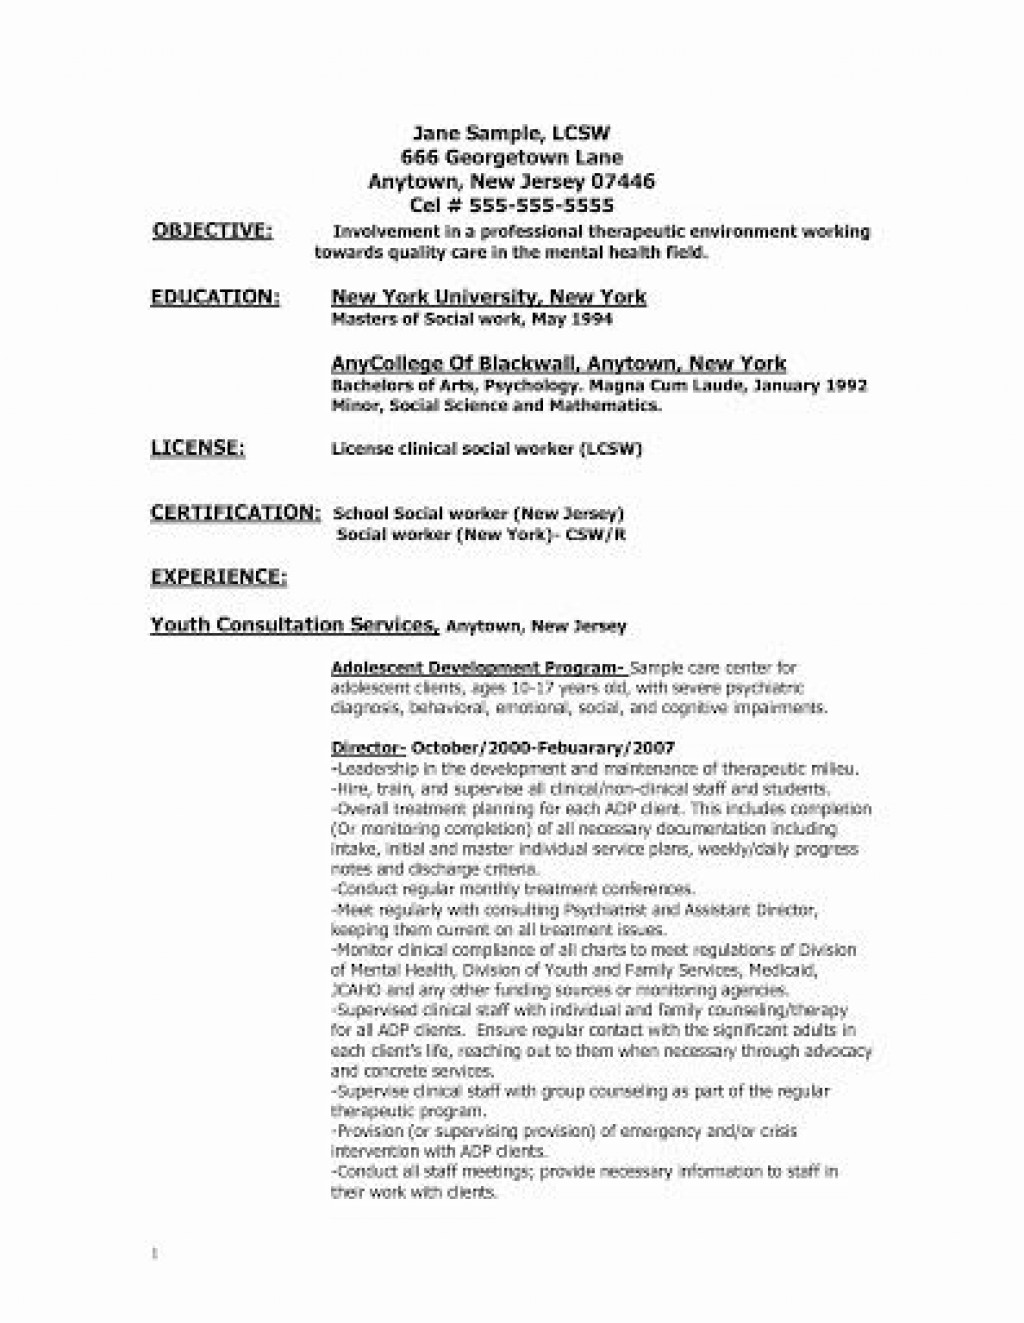 009 Shocking Grad School Resume Template Image  Application Cv Graduate For AdmissionLarge